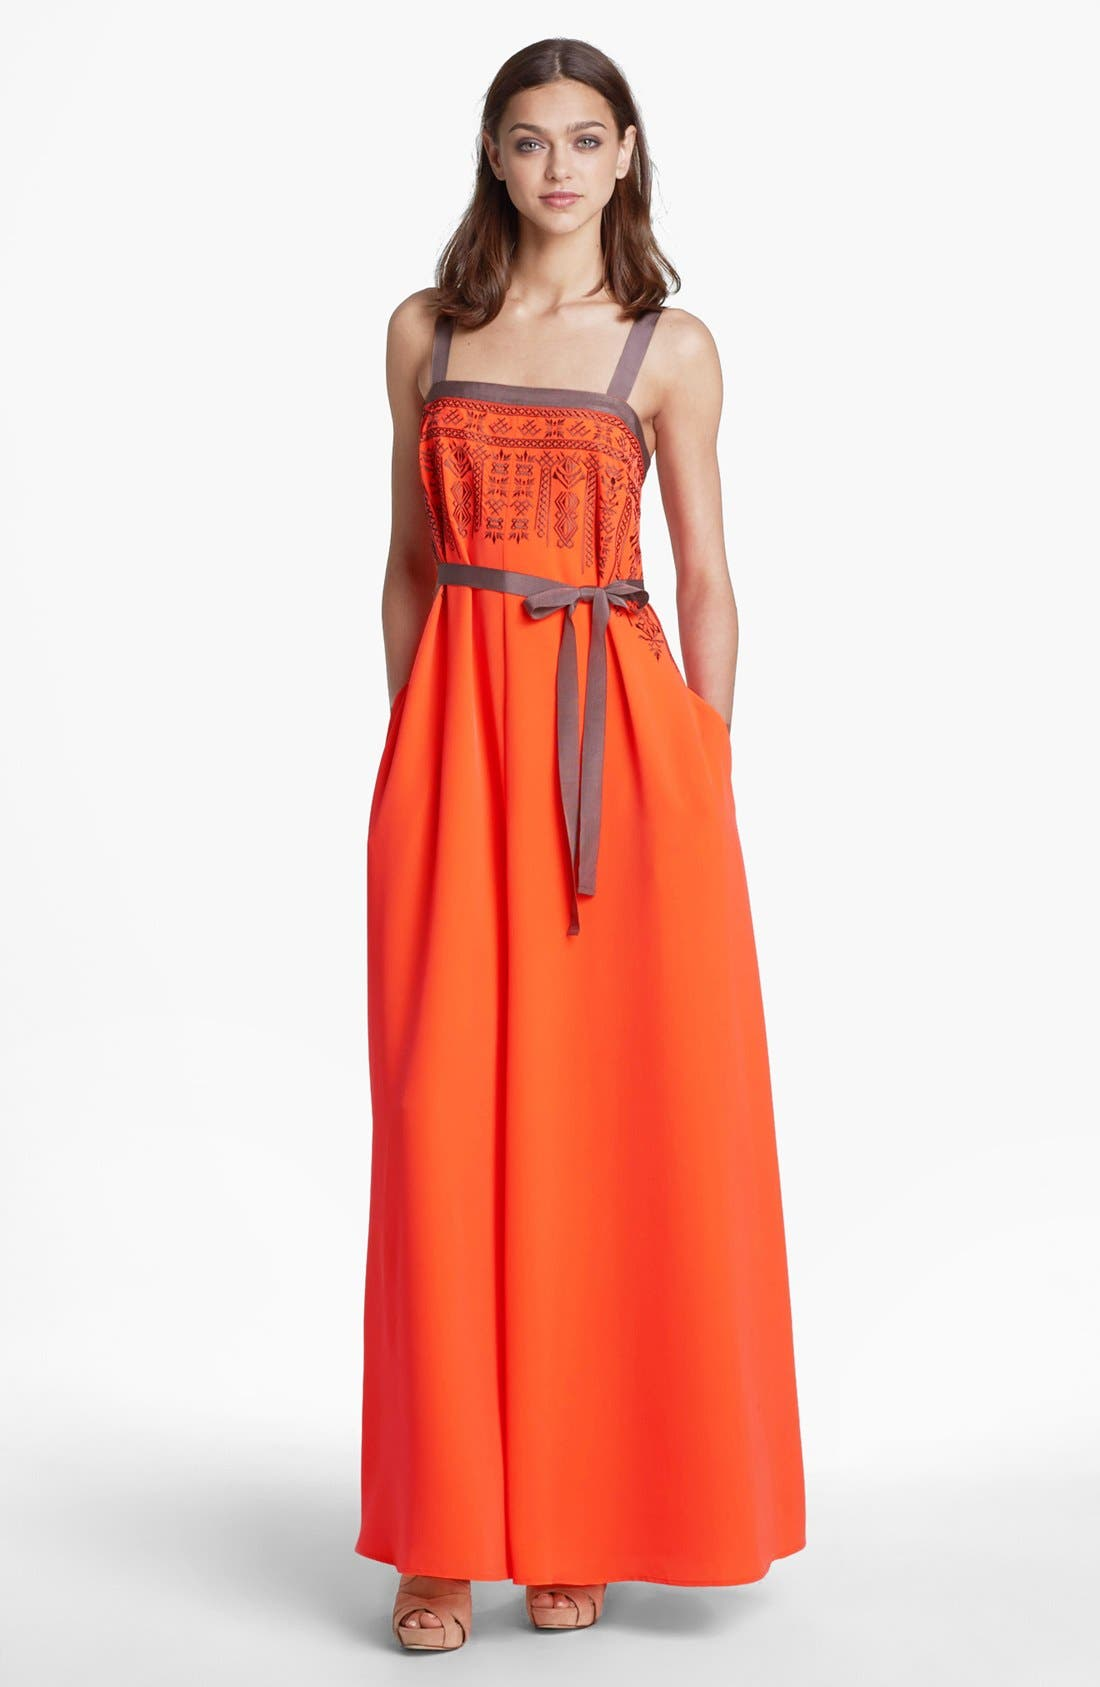 Main Image - Jessica Simpson Embroidered Maxi Dress